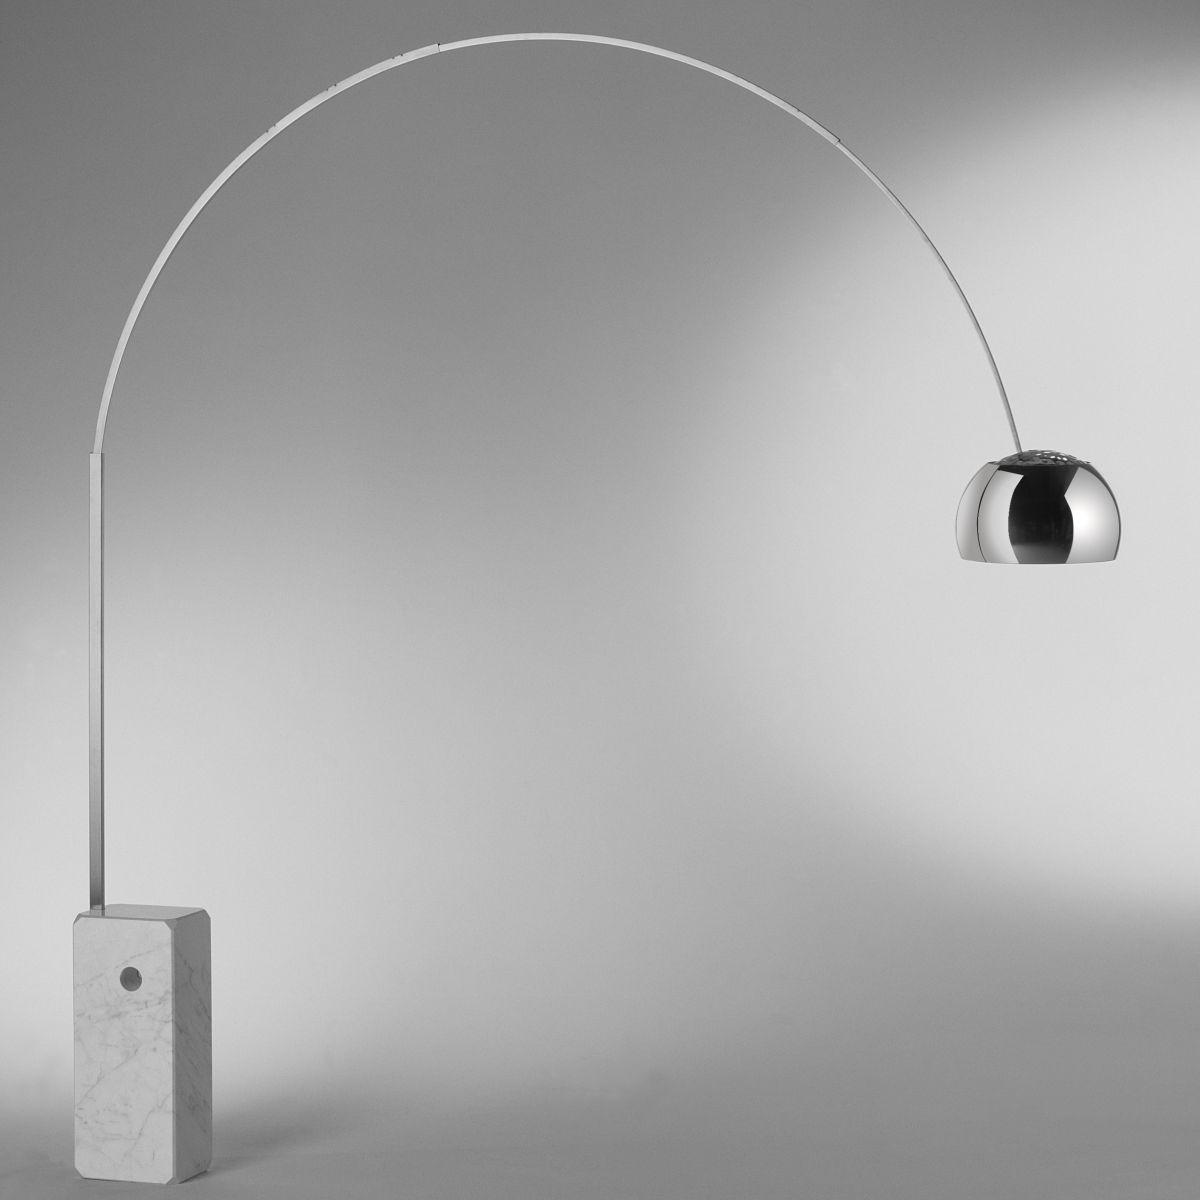 arco lampada lampe arco creativo doppia lampada ad arco pi leggero lu0027 usb carica di. Black Bedroom Furniture Sets. Home Design Ideas